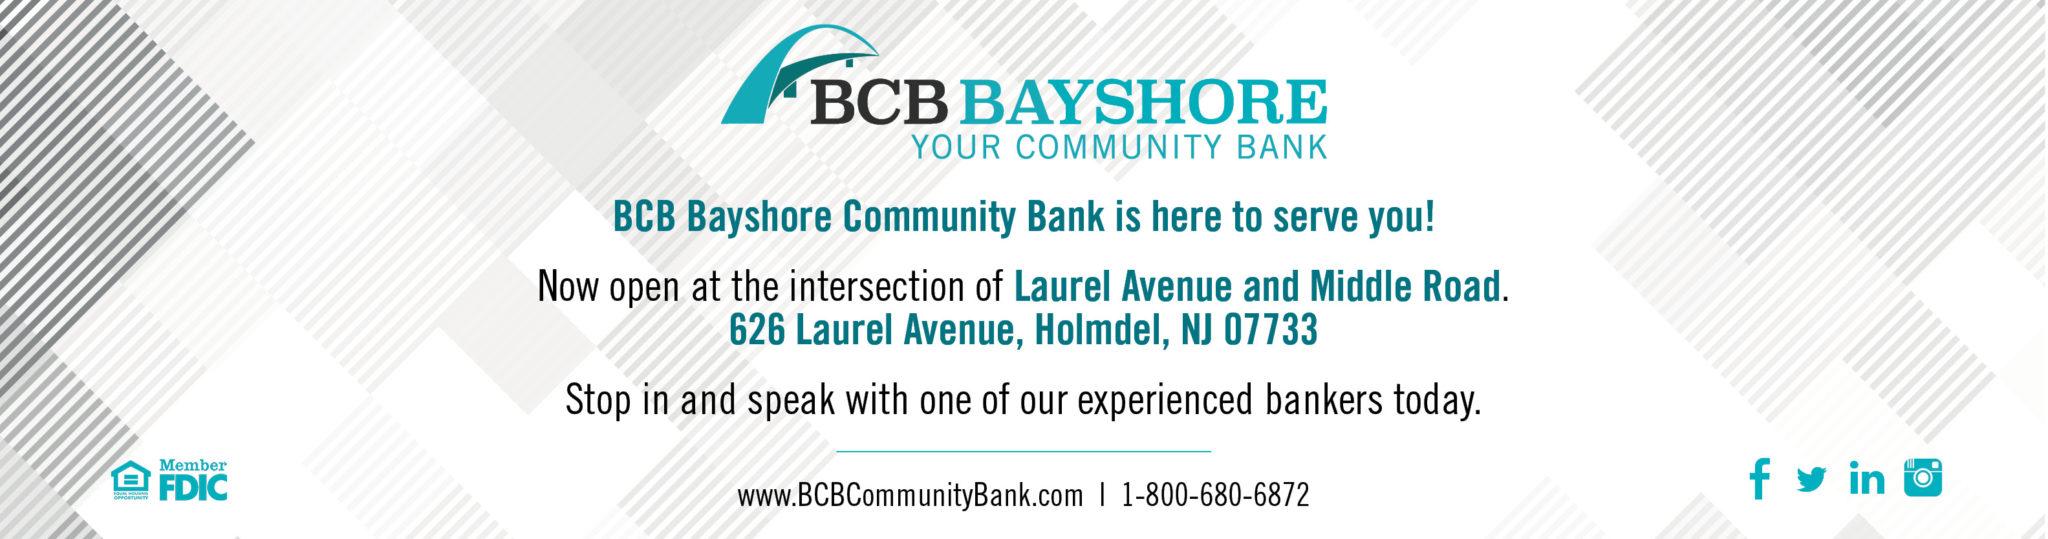 Bayshore Community Bank